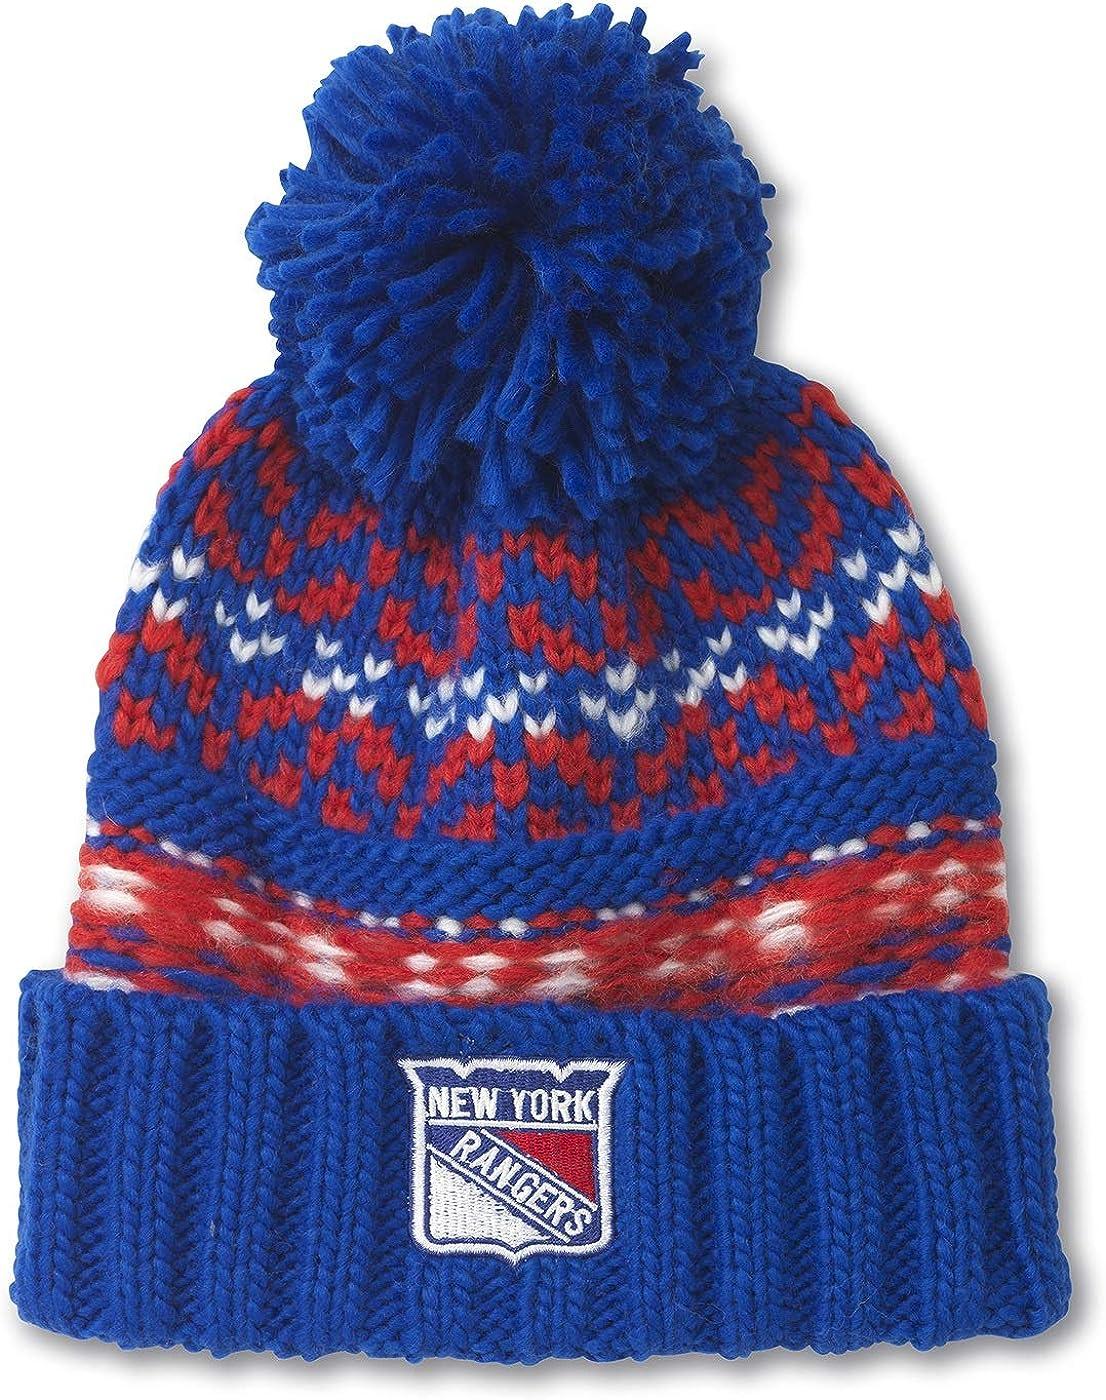 American Needle NHL Gusto Cuffed Pom Beanie Knit Hat